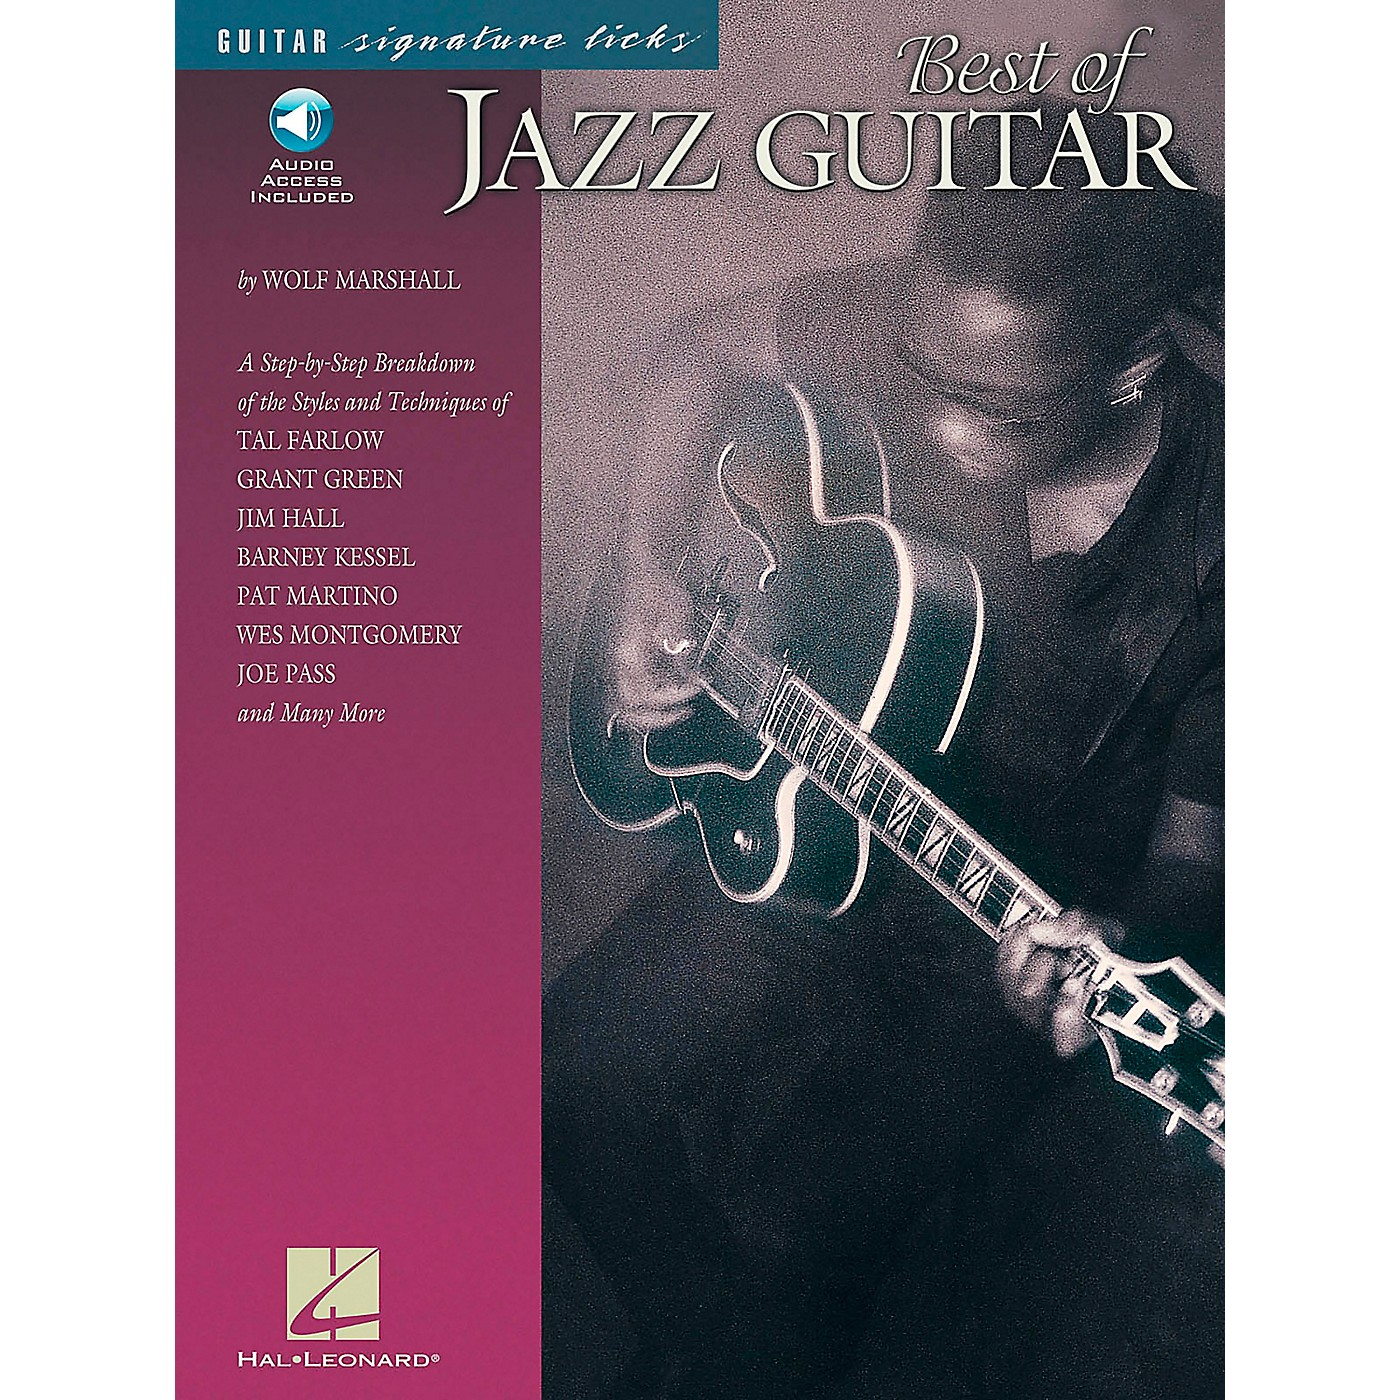 Hal Leonard Best of Jazz Guitar Signature Licks Book with CD thumbnail